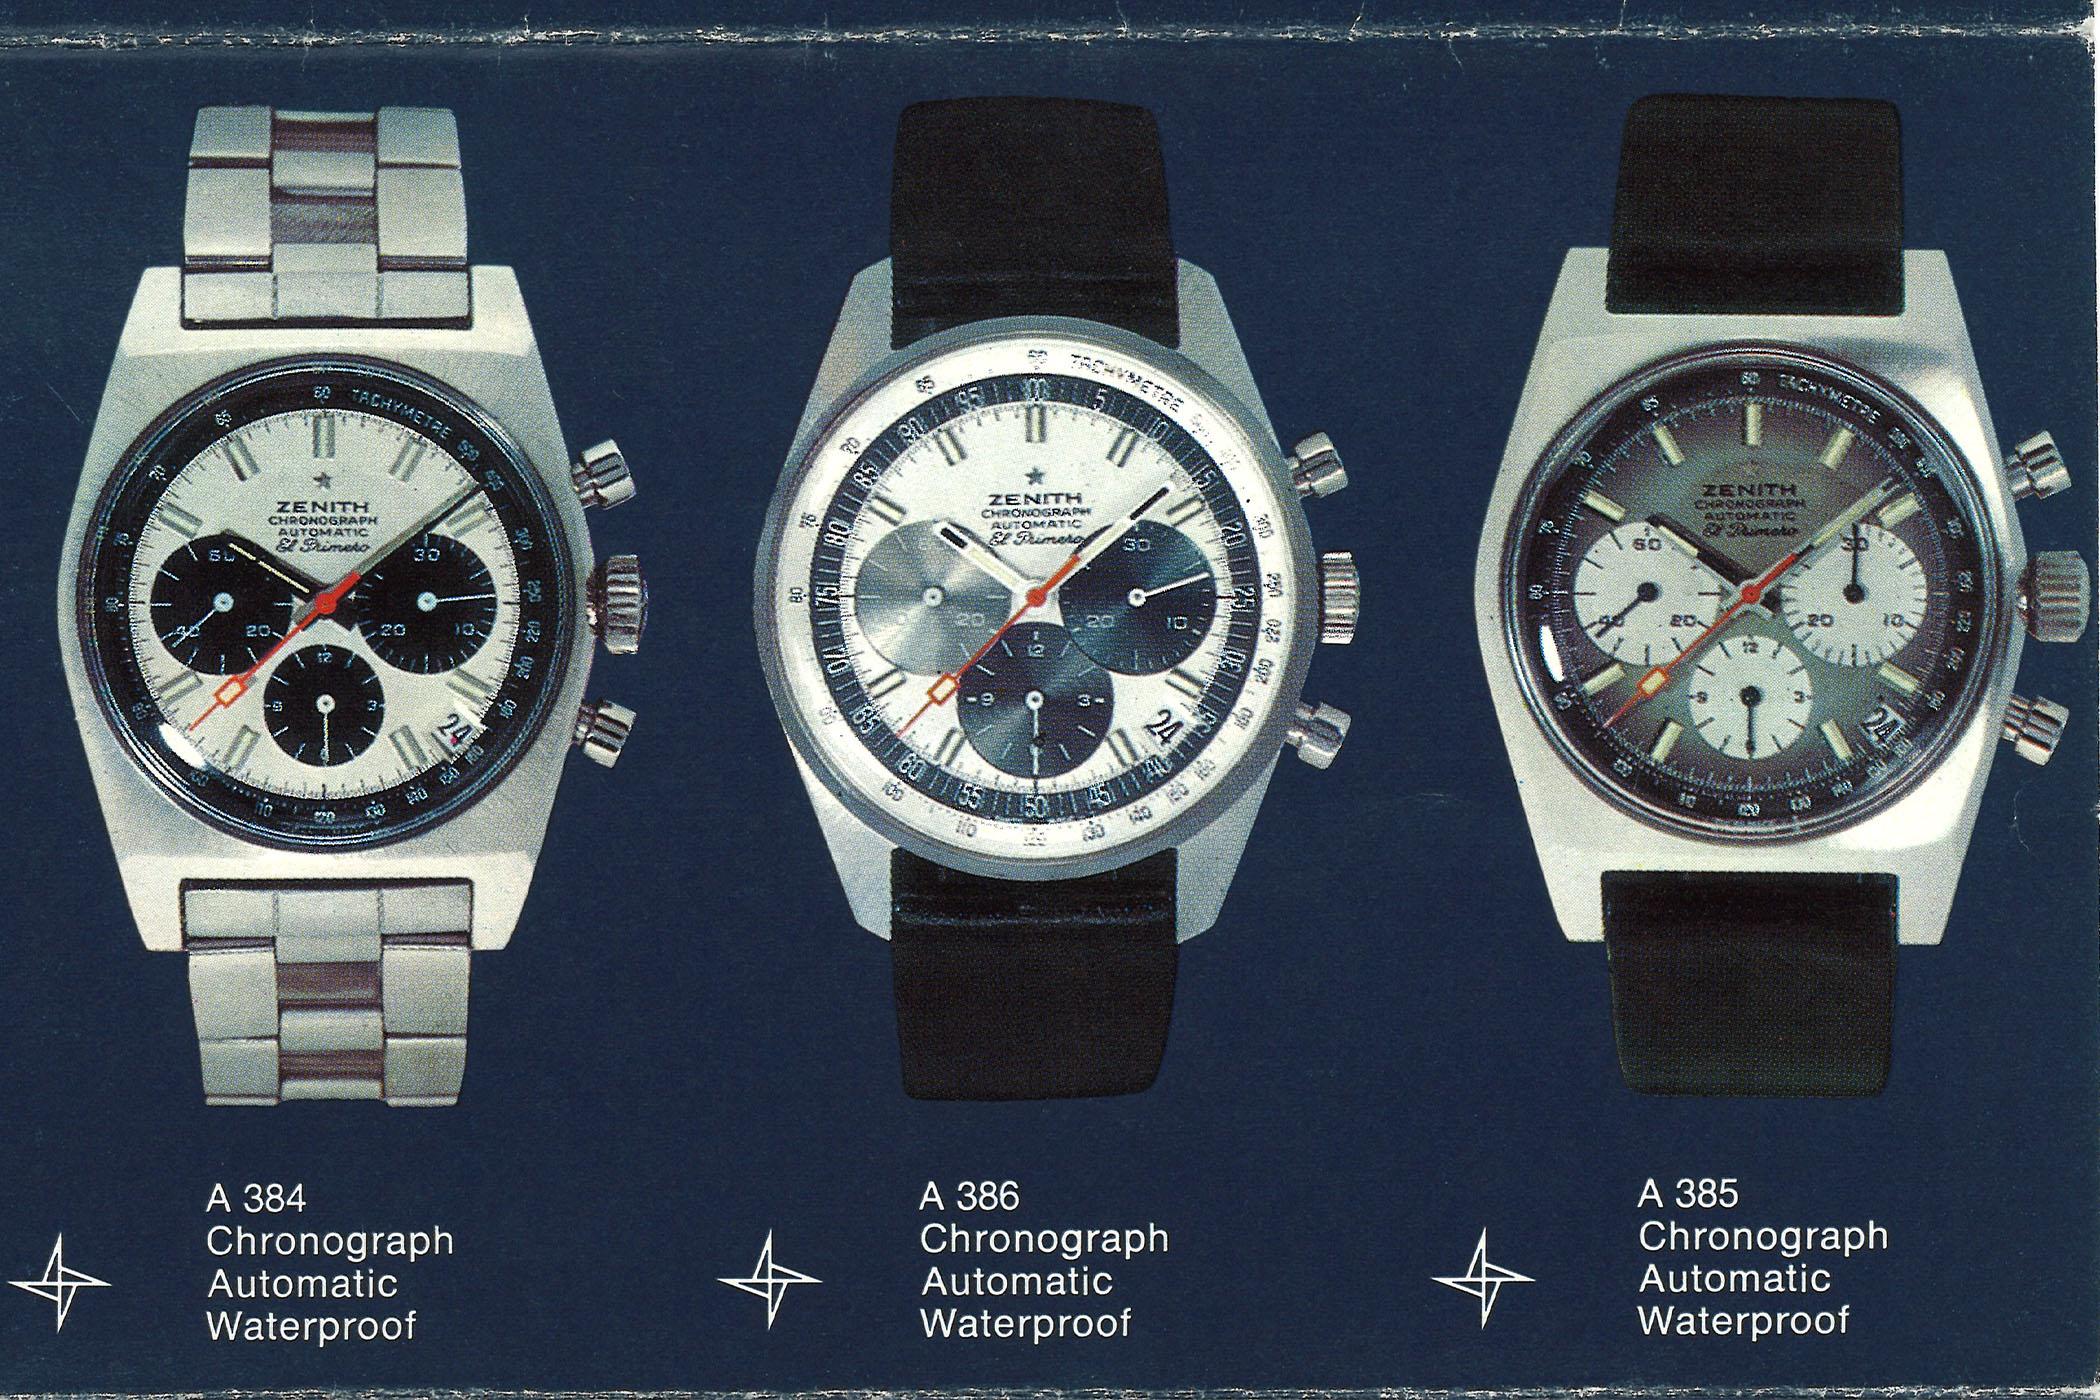 Zenith El Primero 1969 trilogy A384 A385 A386 watches